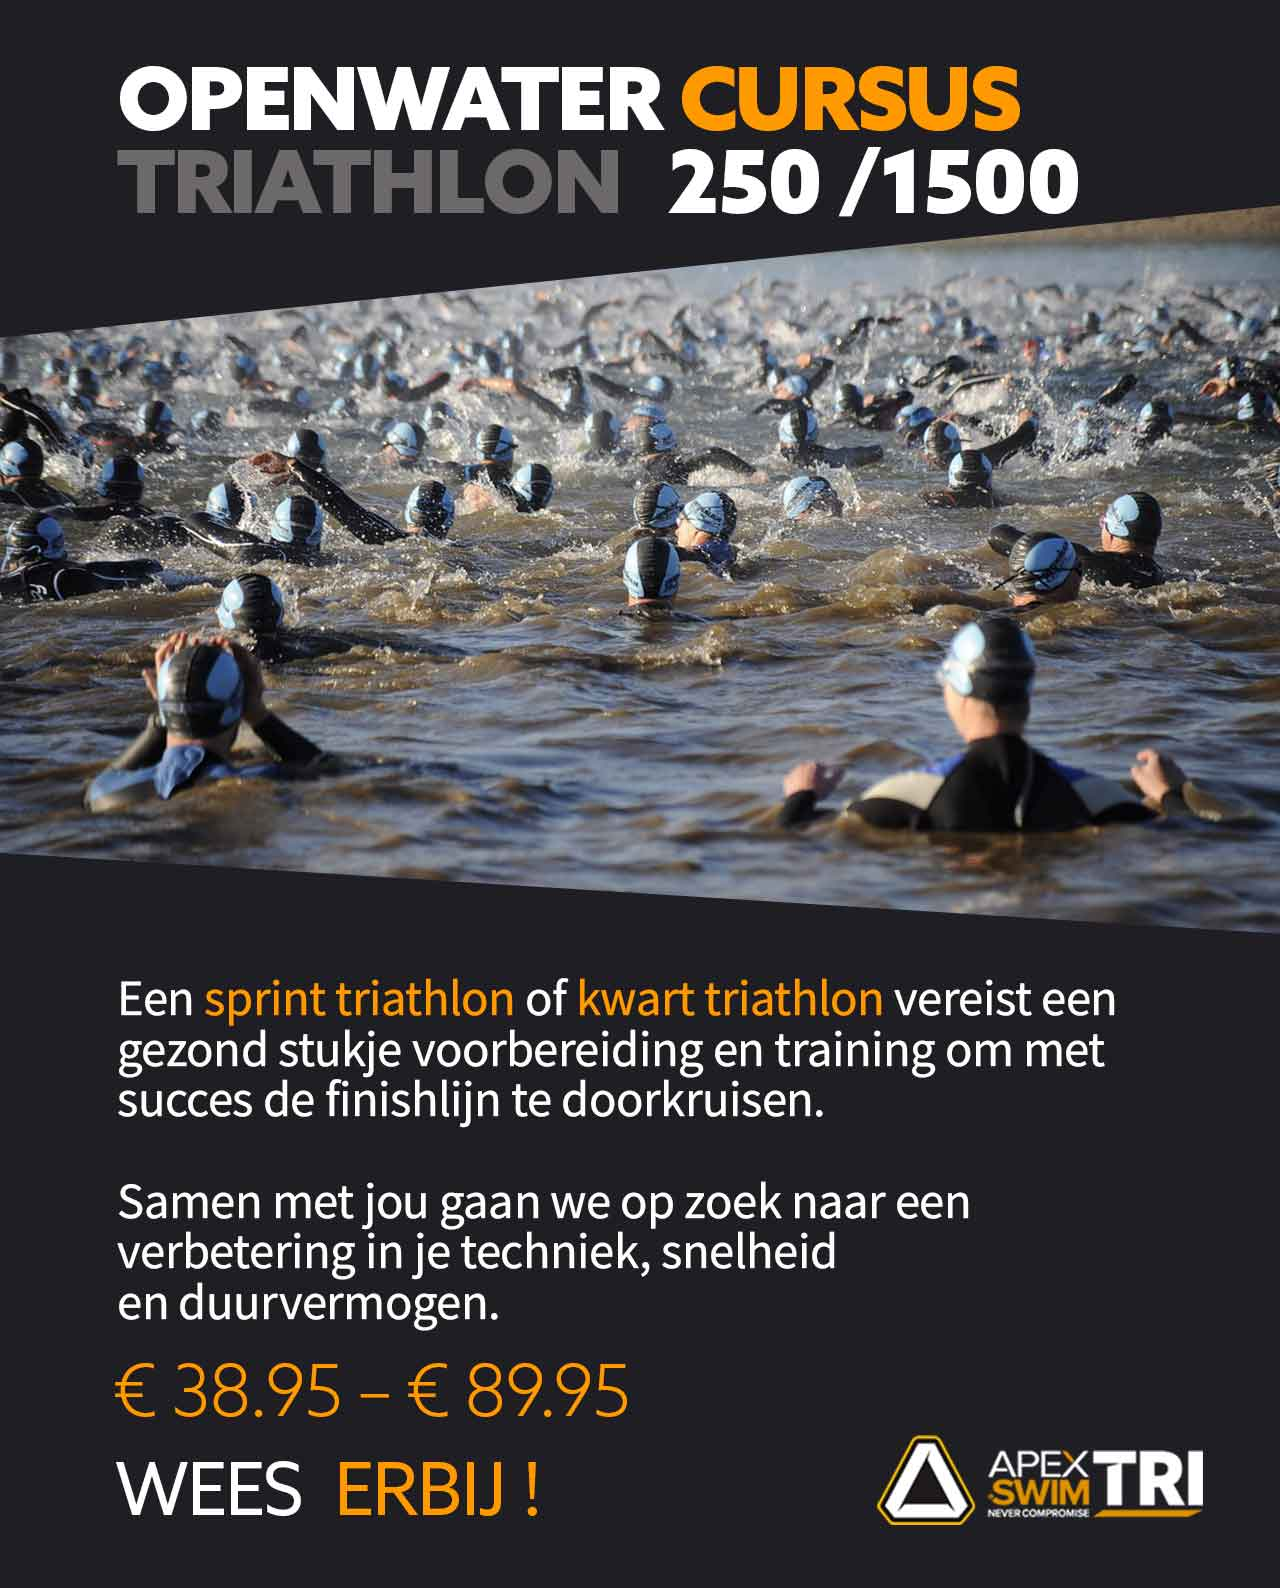 openwatercursus-tri250-2500-ipad-apexswim-400-mei